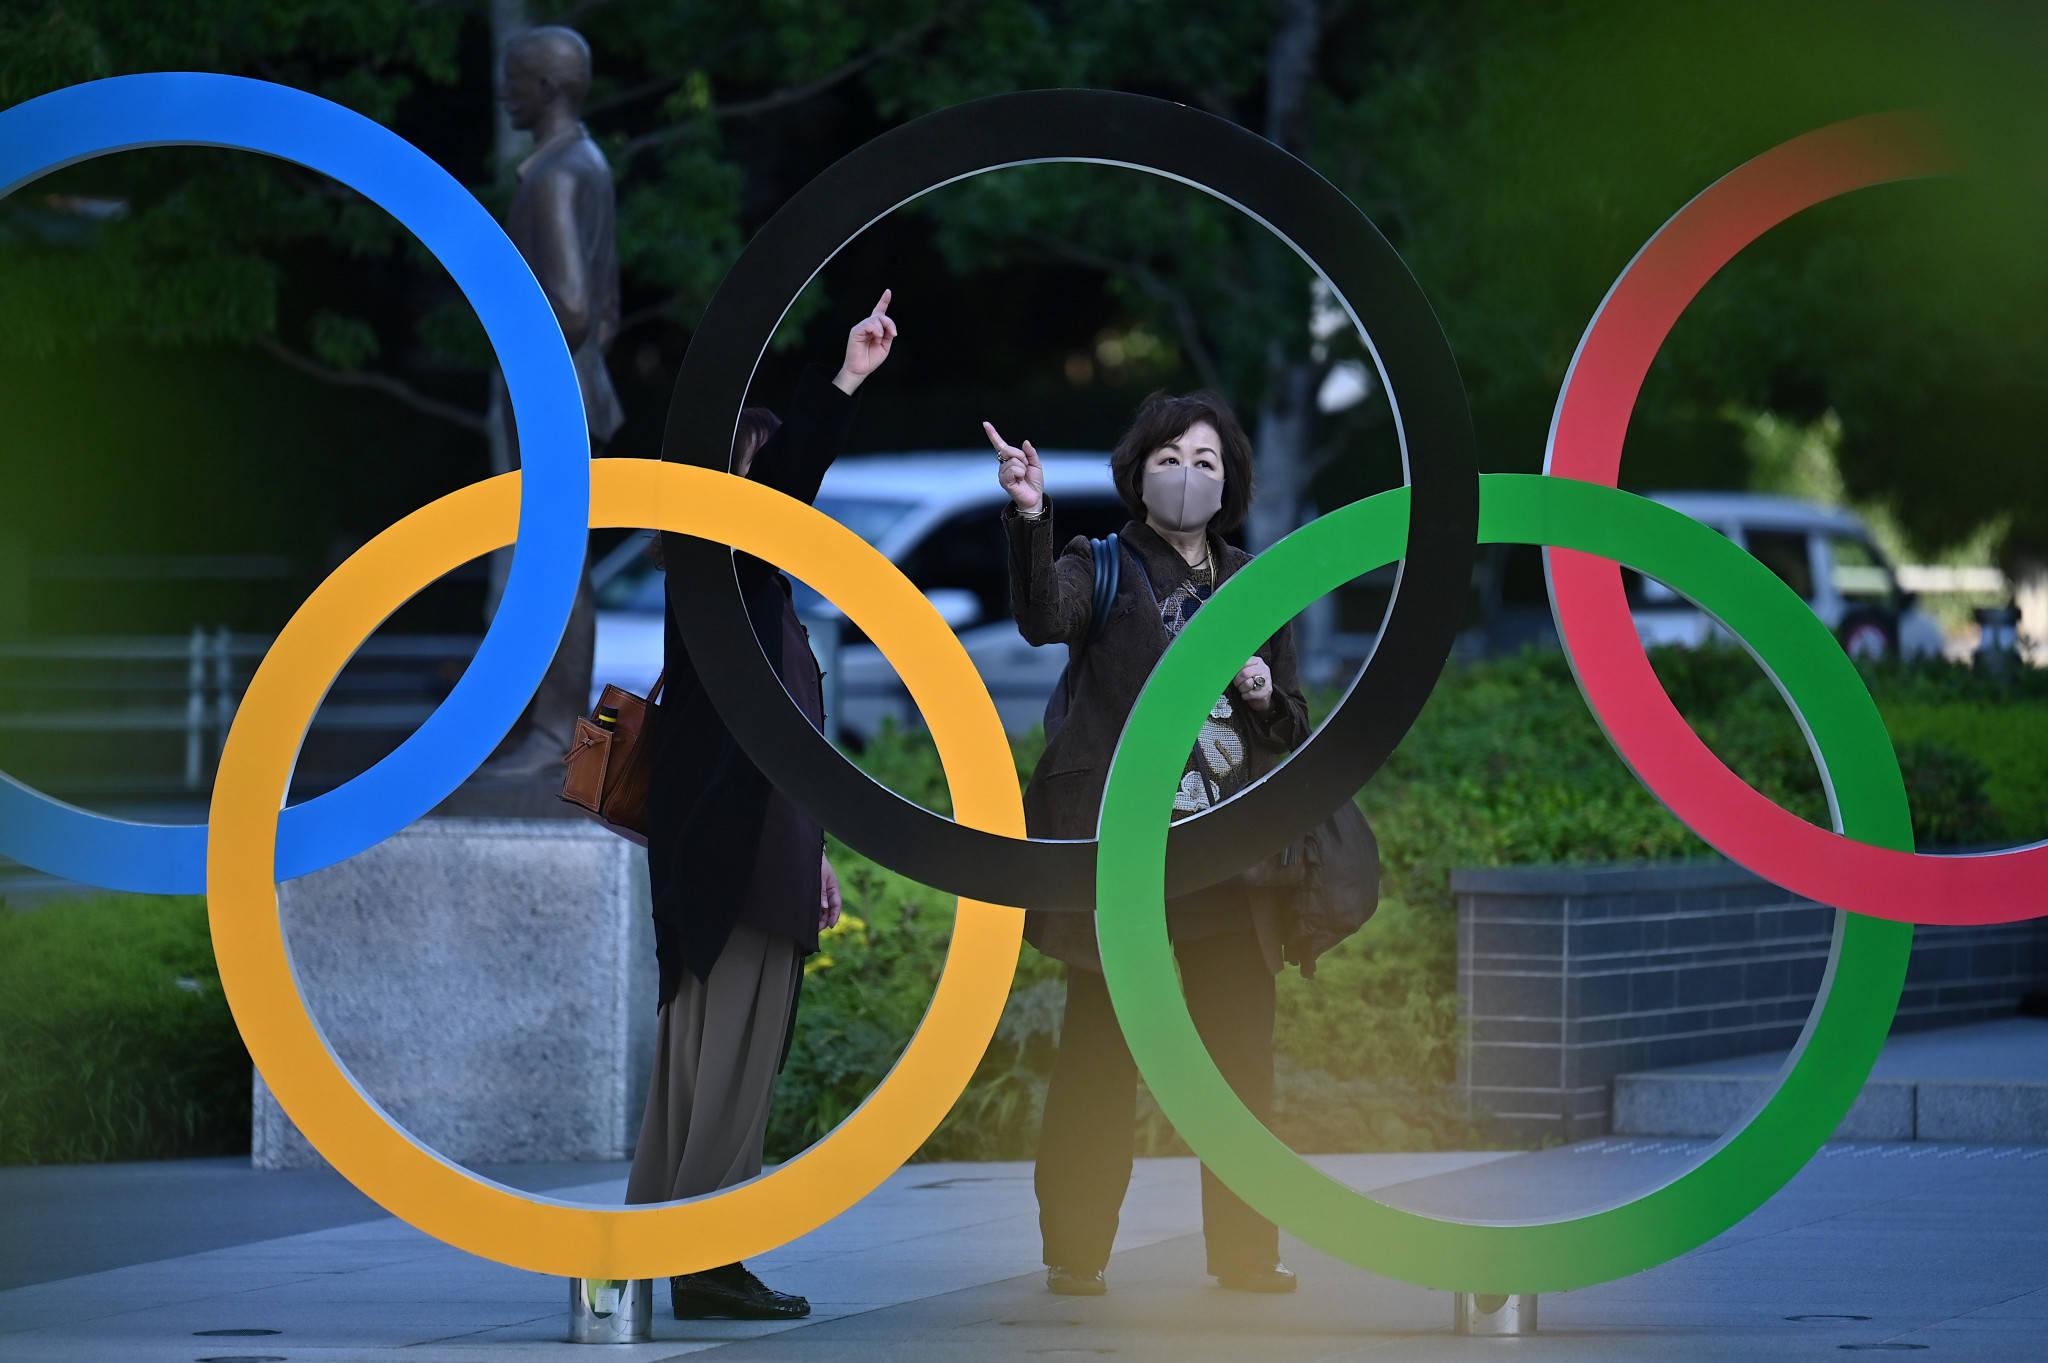 IOC高官:东京奥运有4套方案 相关限制或更灵活